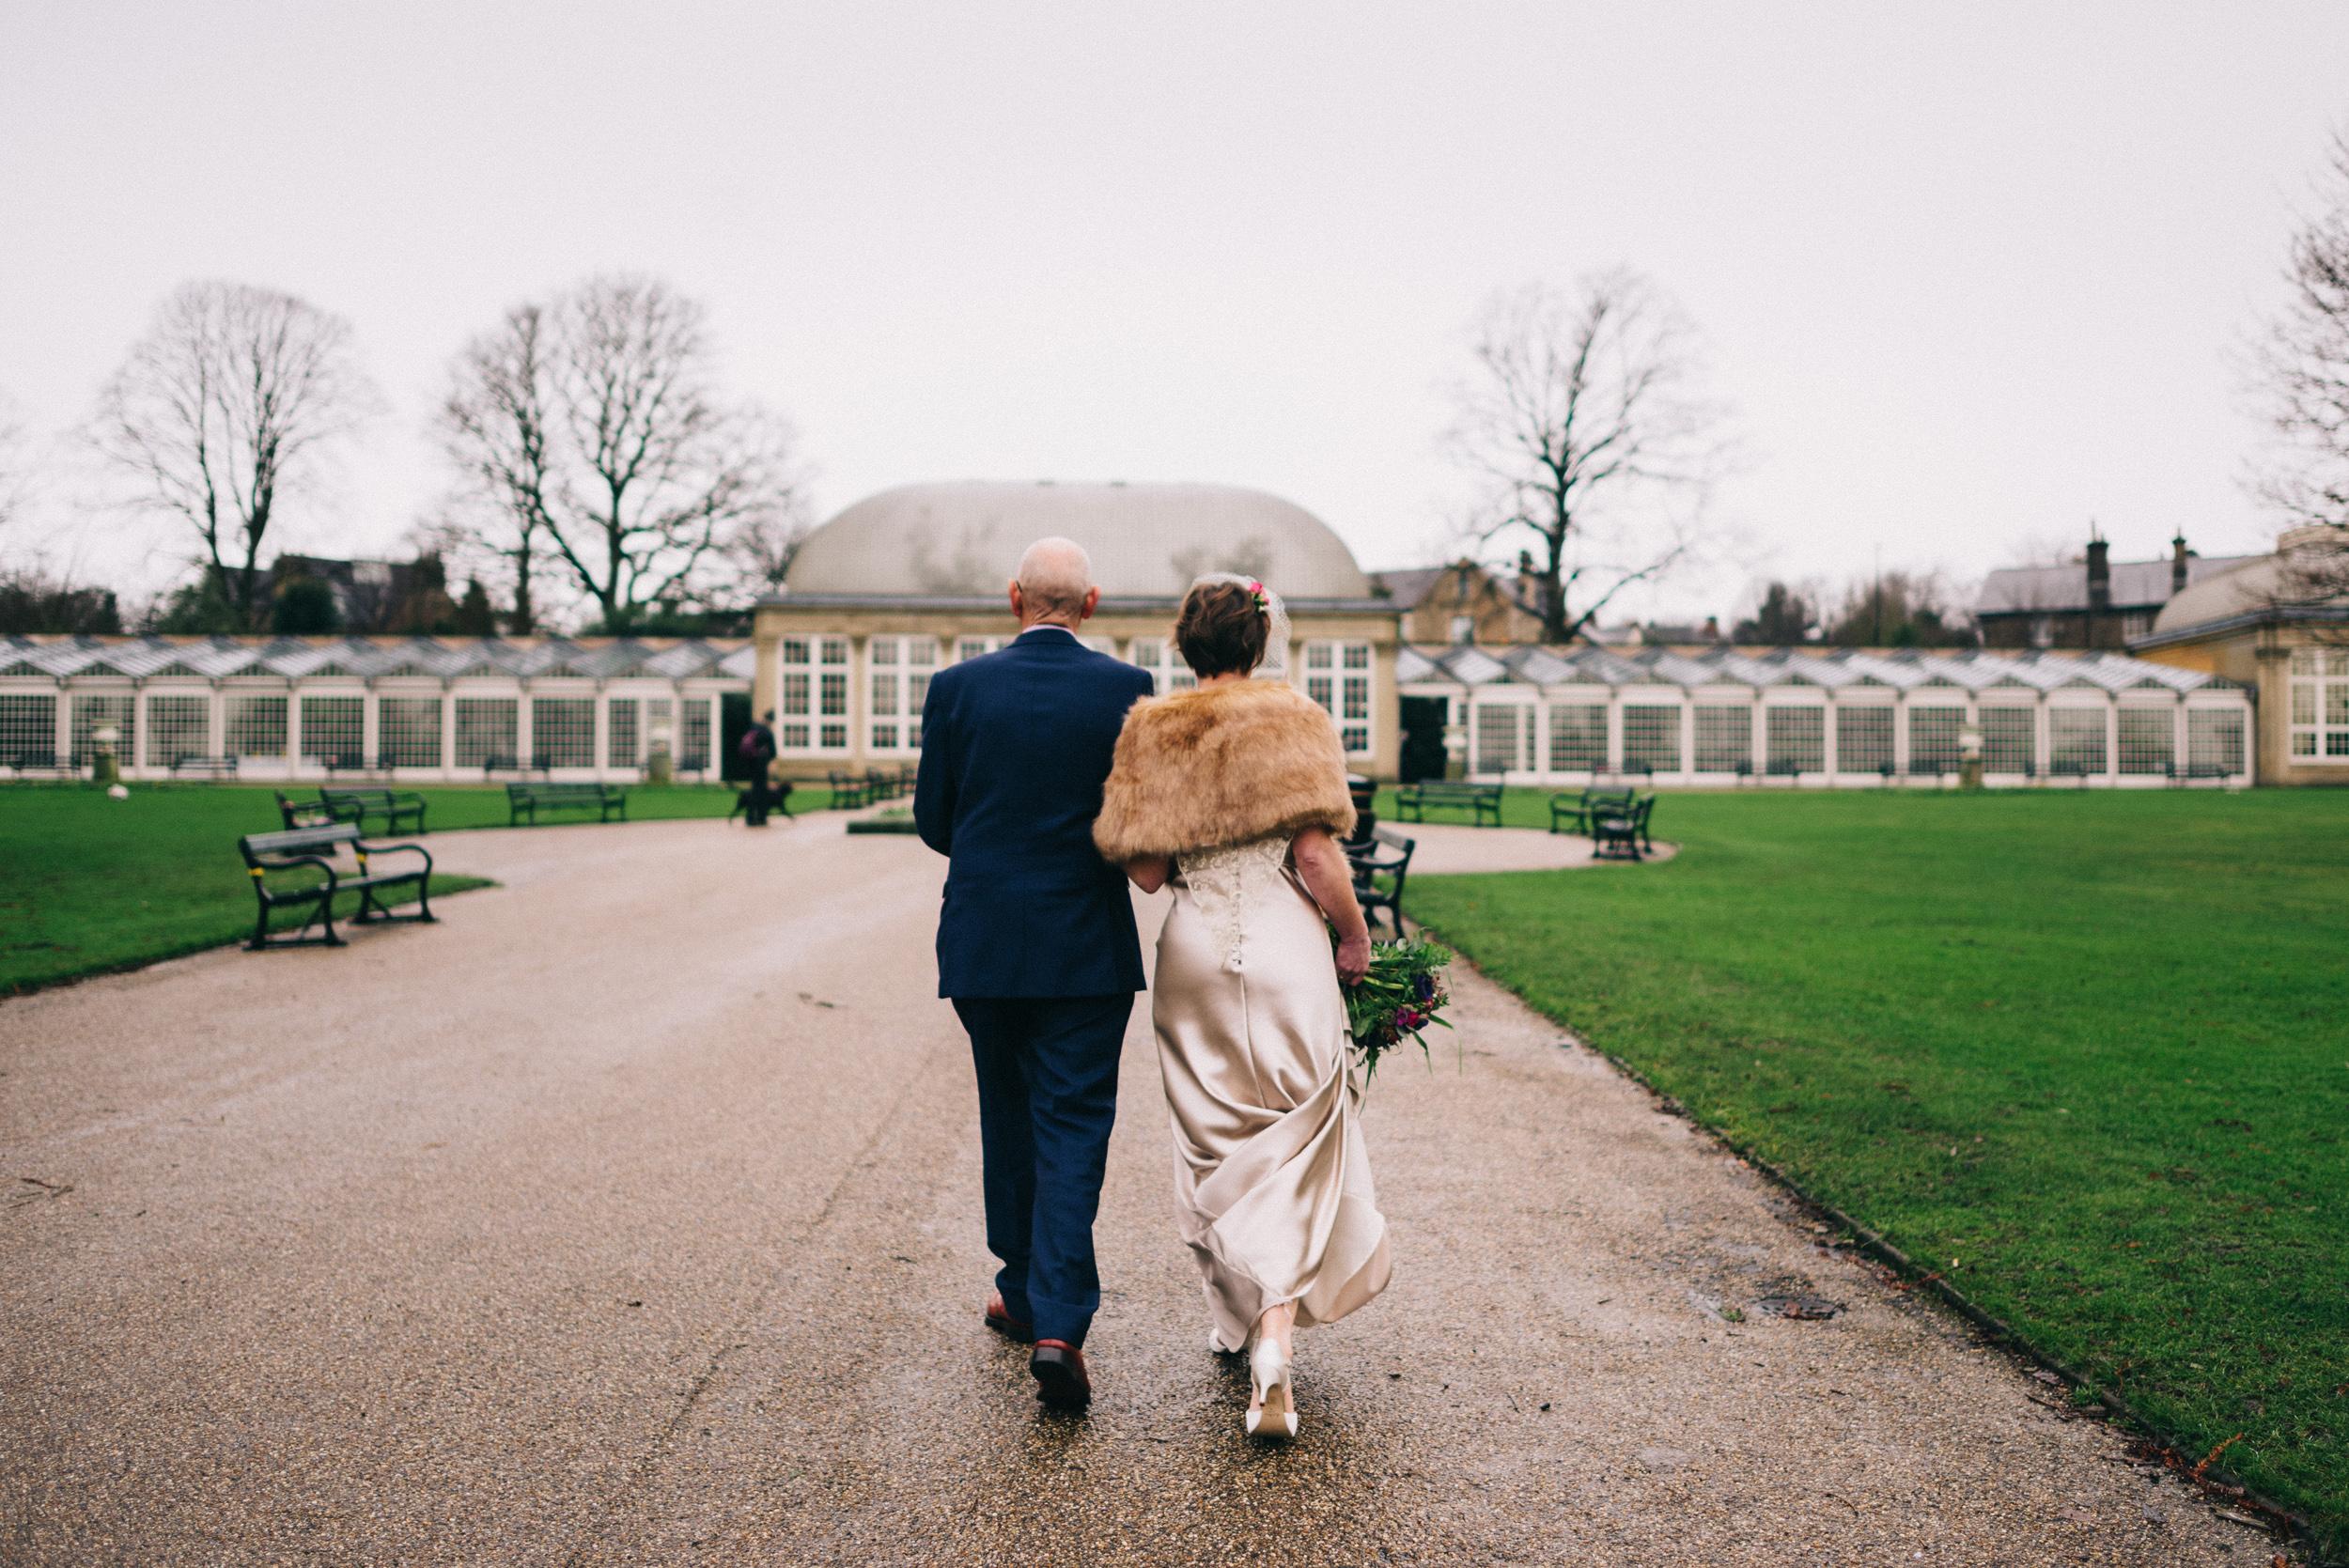 Alice-Bias-Cut-Silk-Wedding-Dress-Kate-Beaumont-Sheffield-Botanical-Gardens-by-Peakography-7.jpg